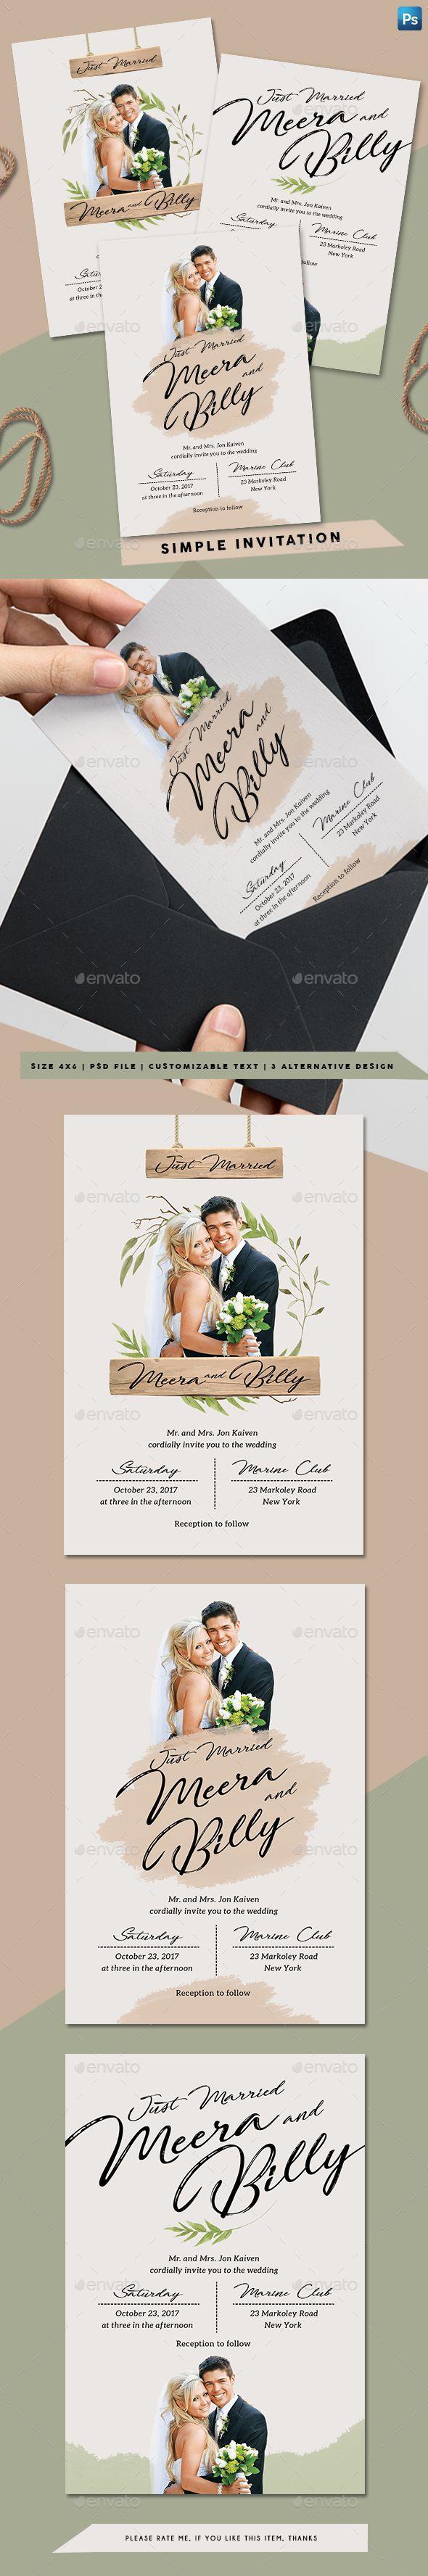 Simple invitation photoshop psd 4x6 just married available simple invitation photoshop psd 4x6 just married available here httpsgraphicriveritemsimple invitation20547229refpxcr maxwellsz